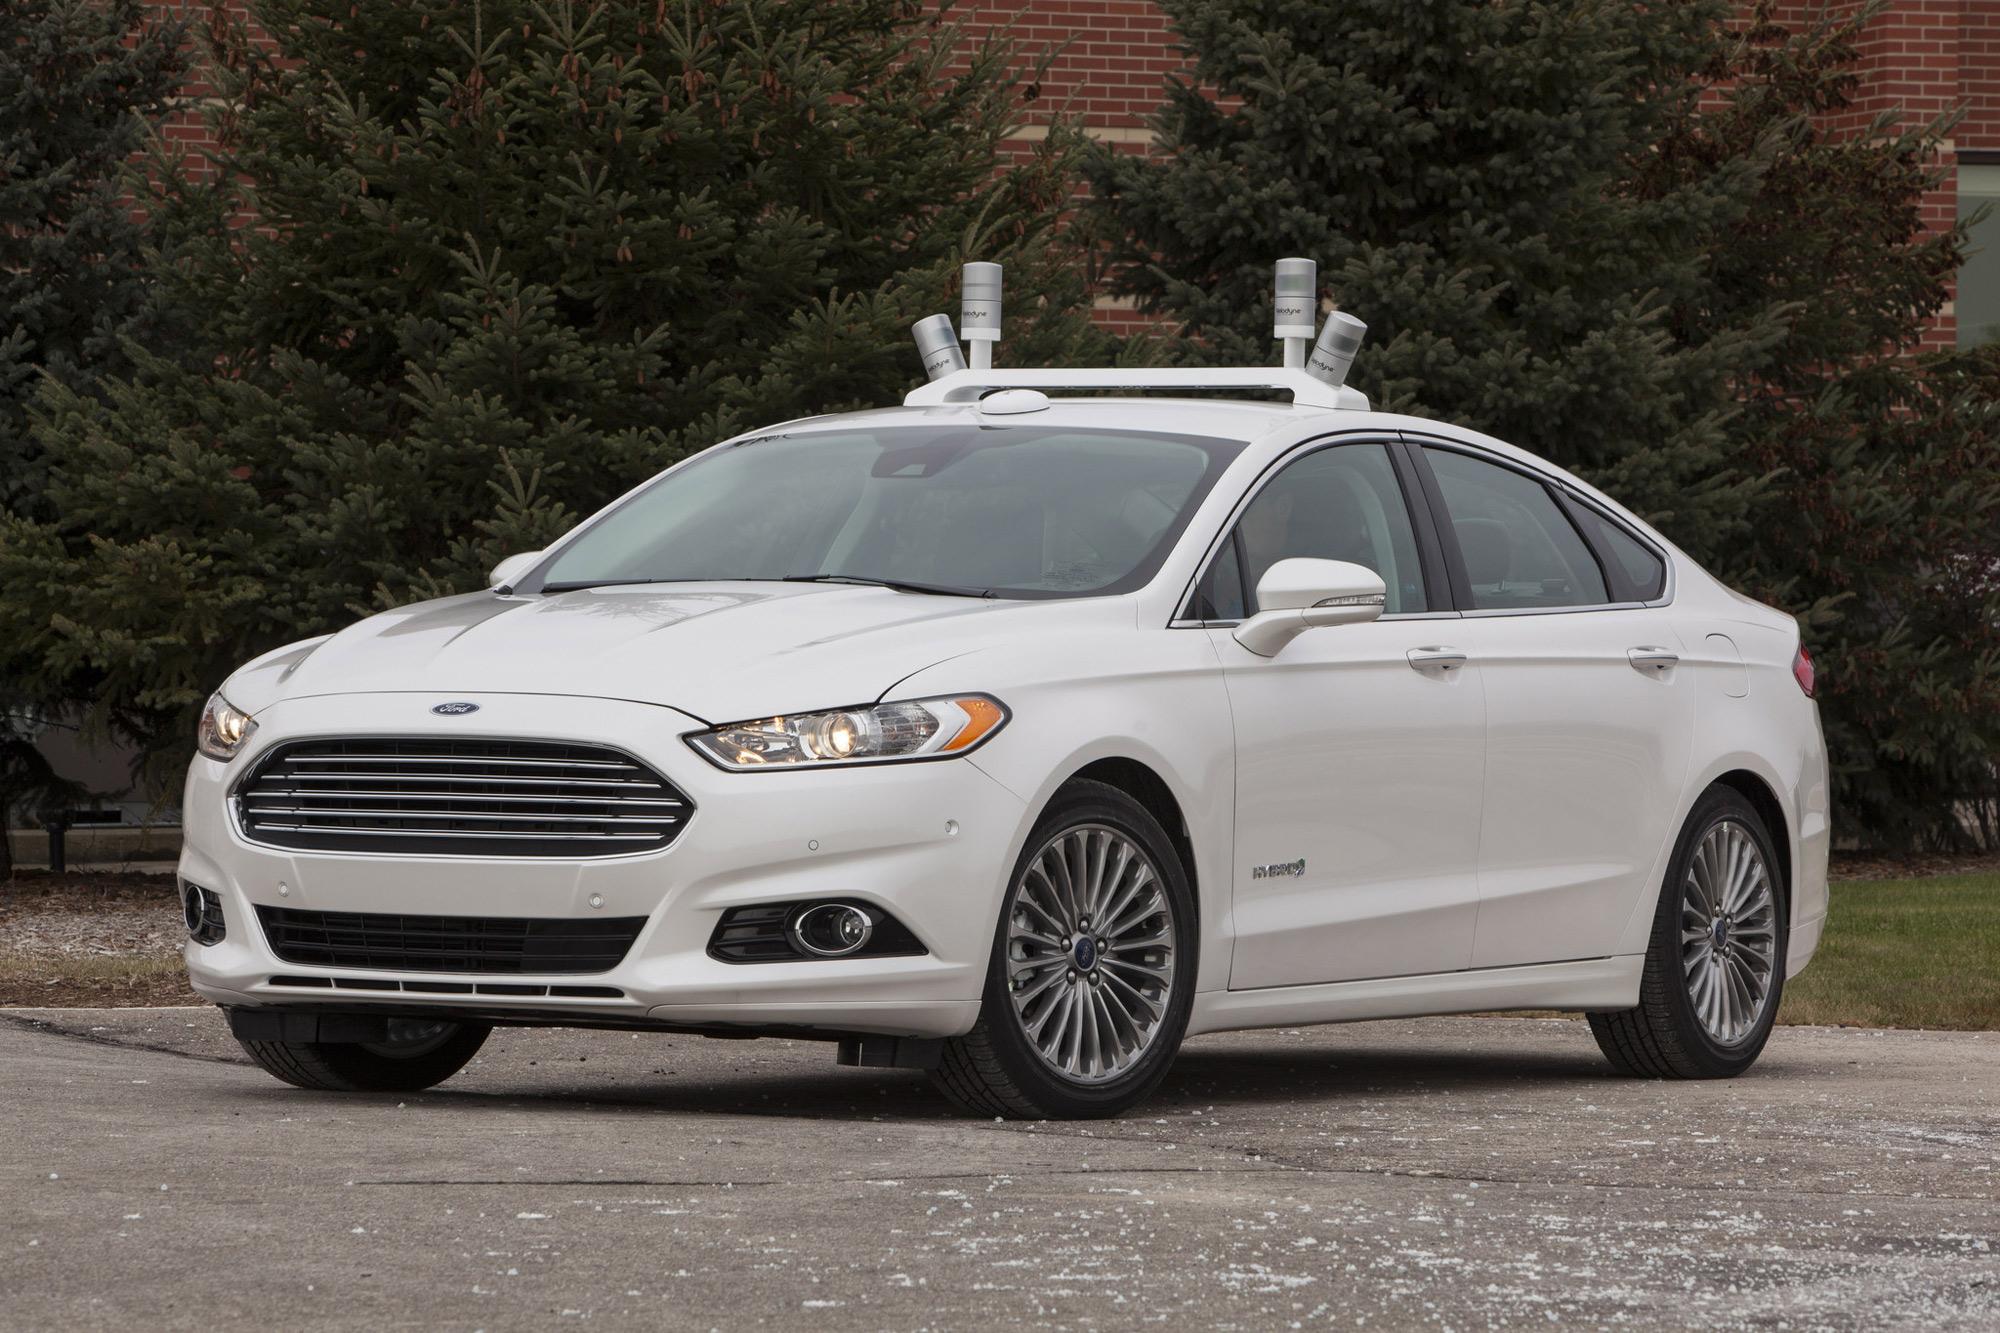 Ford Fusion hybrid autonomous car